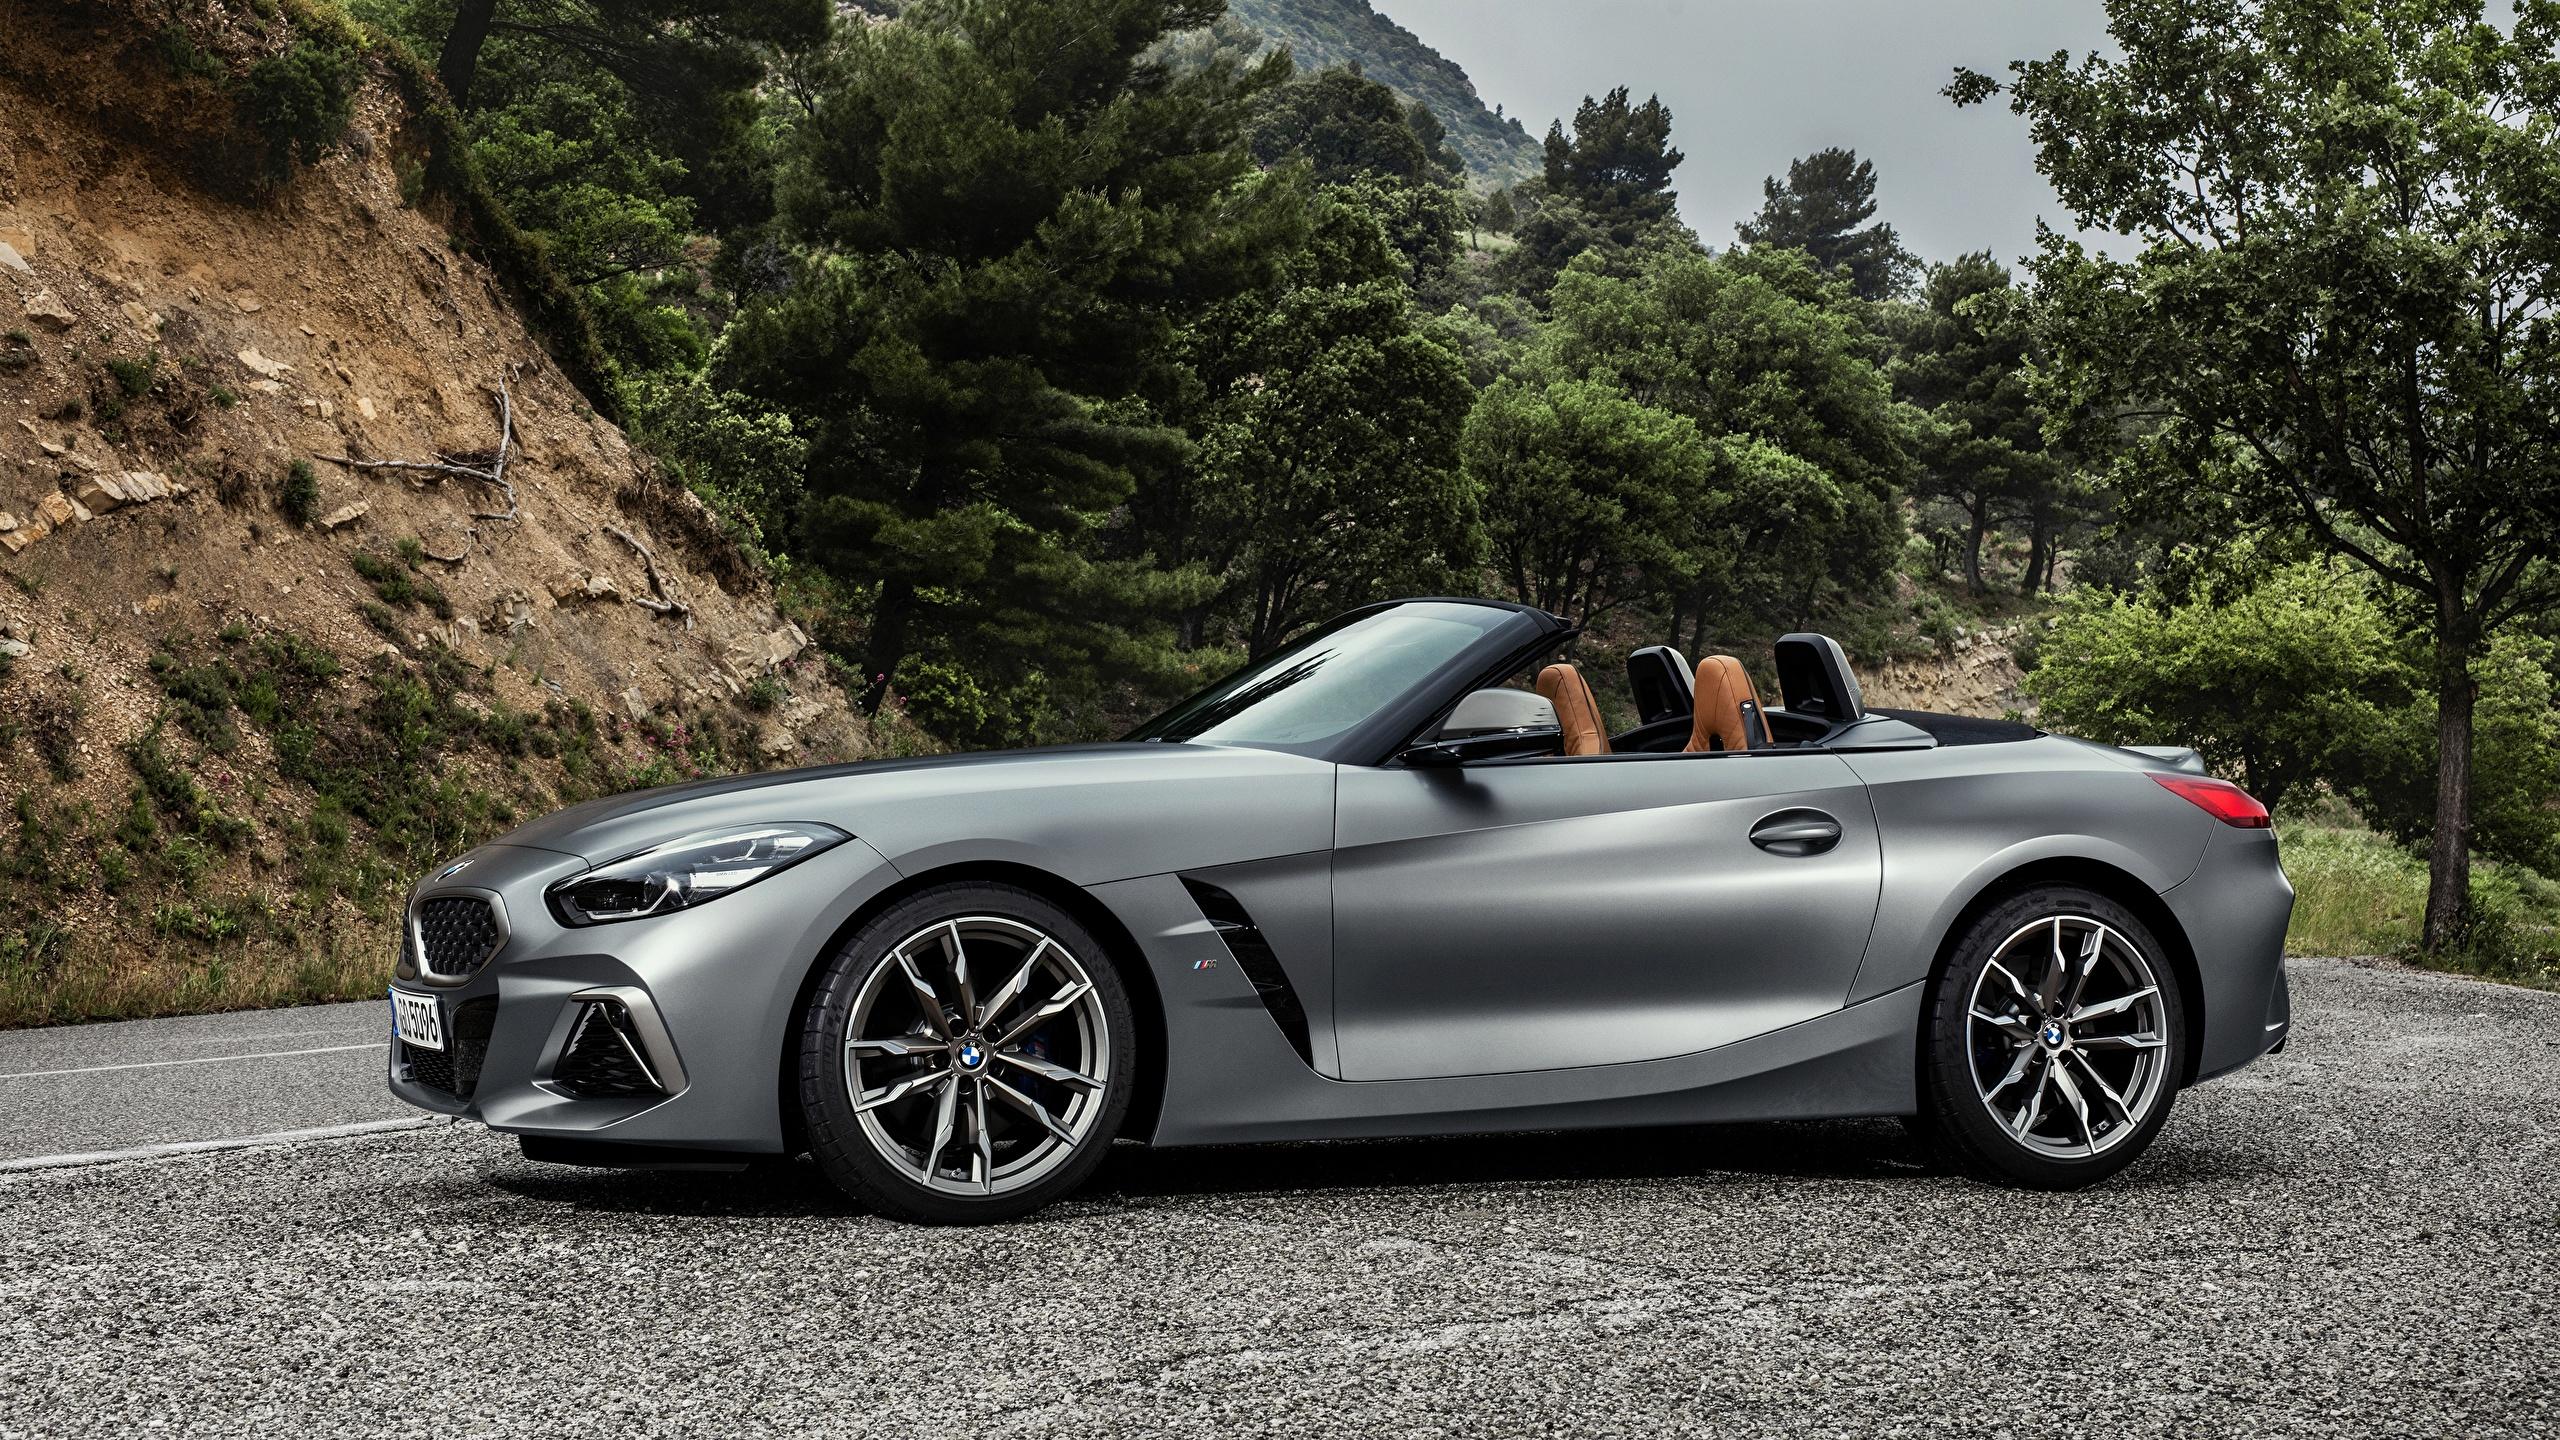 Image BMW Z4 M40i 2019 G29 Silver color auto Side 2560x1440